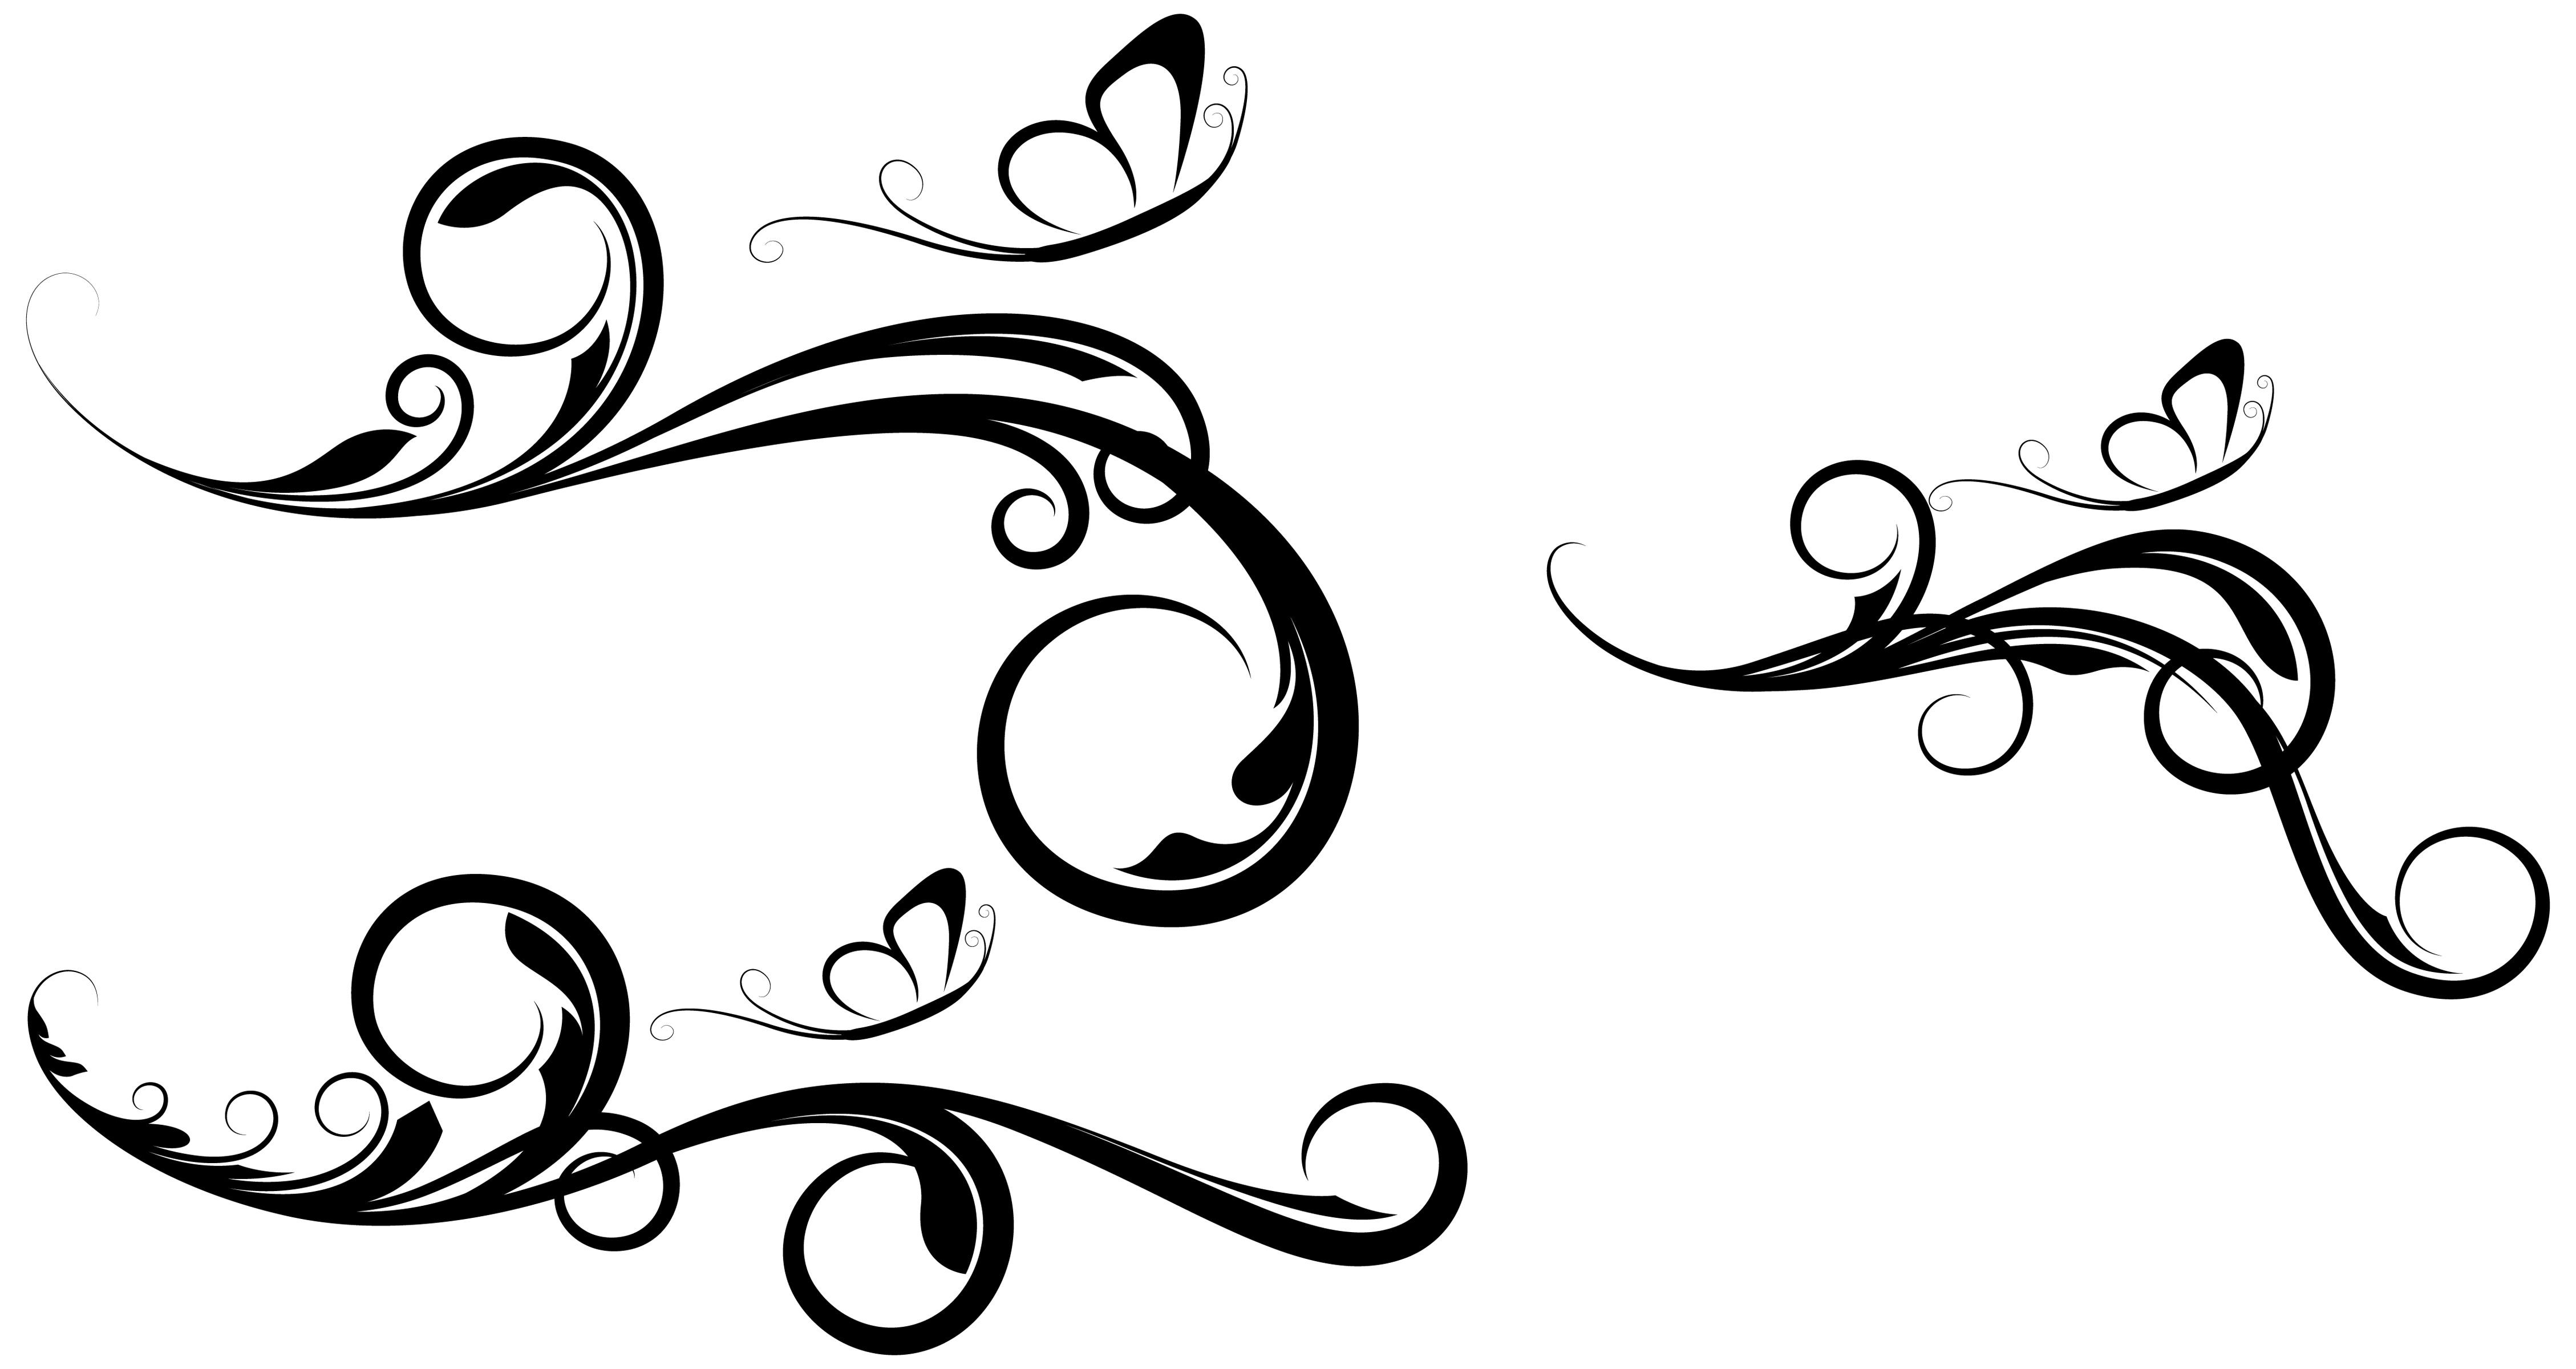 17 Fancy Swirl Vector Images - Free Elegant Vector Swirls, Decorative ...